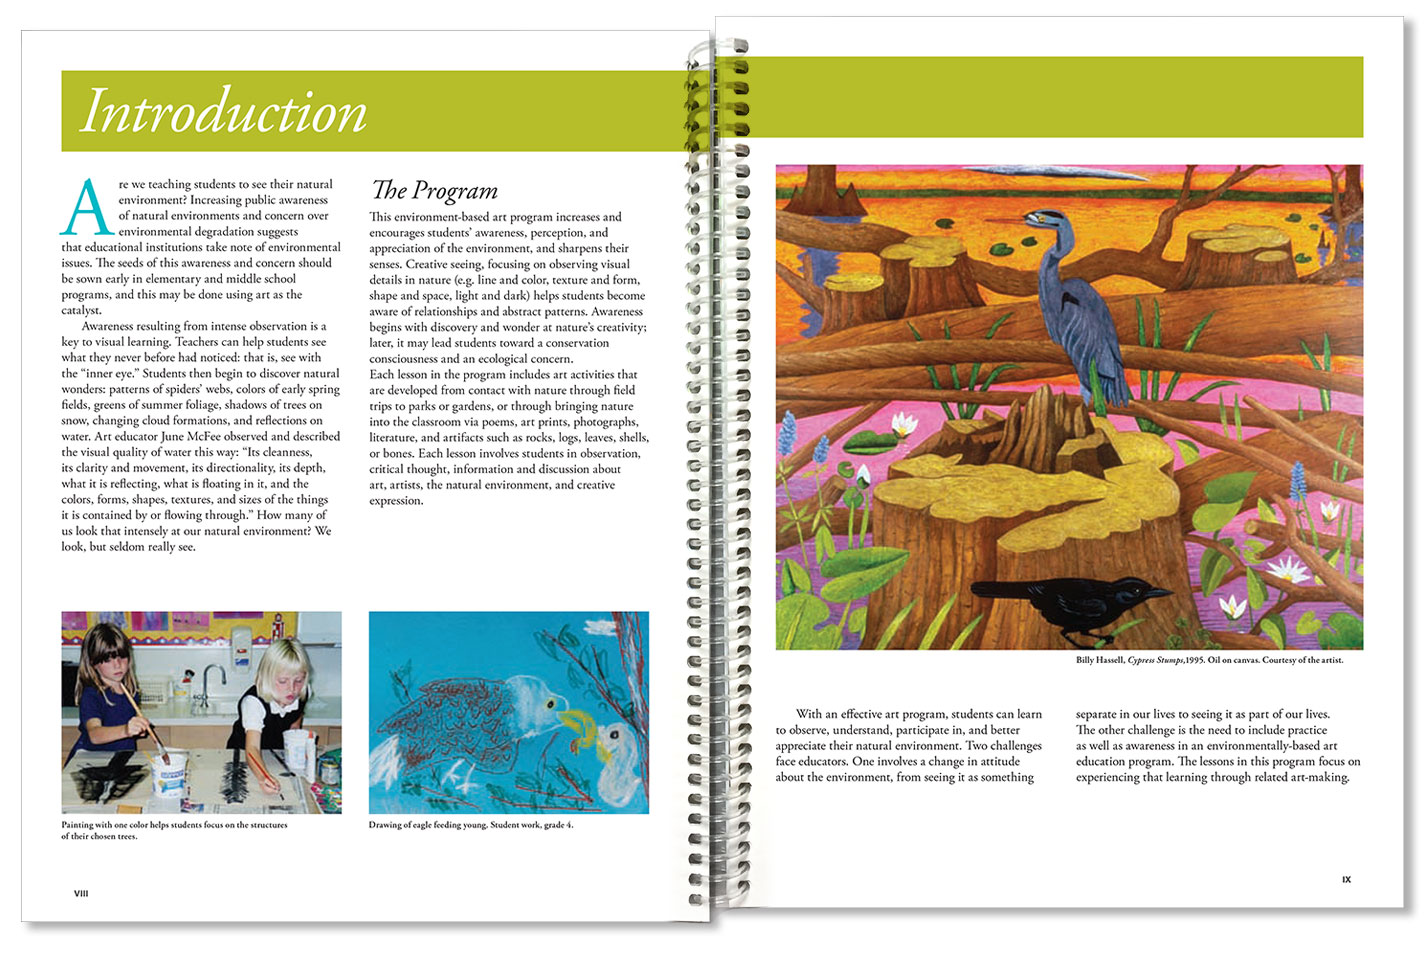 Art Education & Eco Awareness